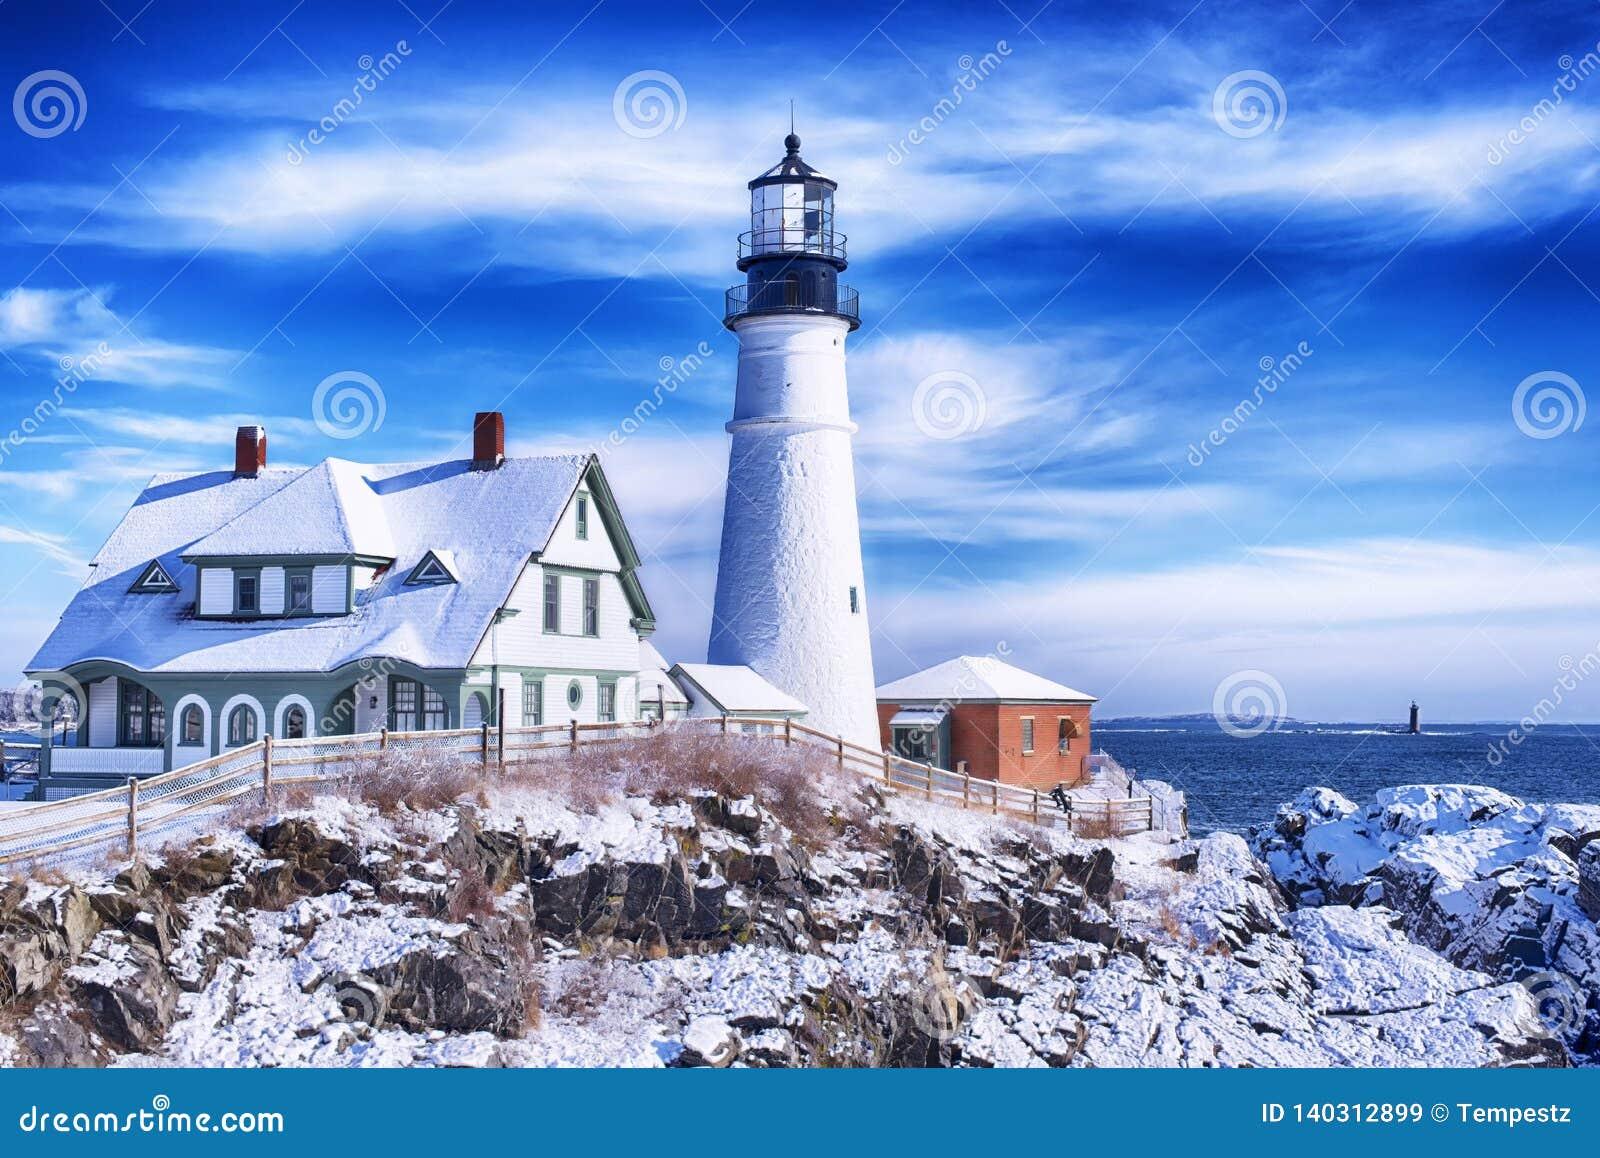 Portland Maine Headlight Winter Scene